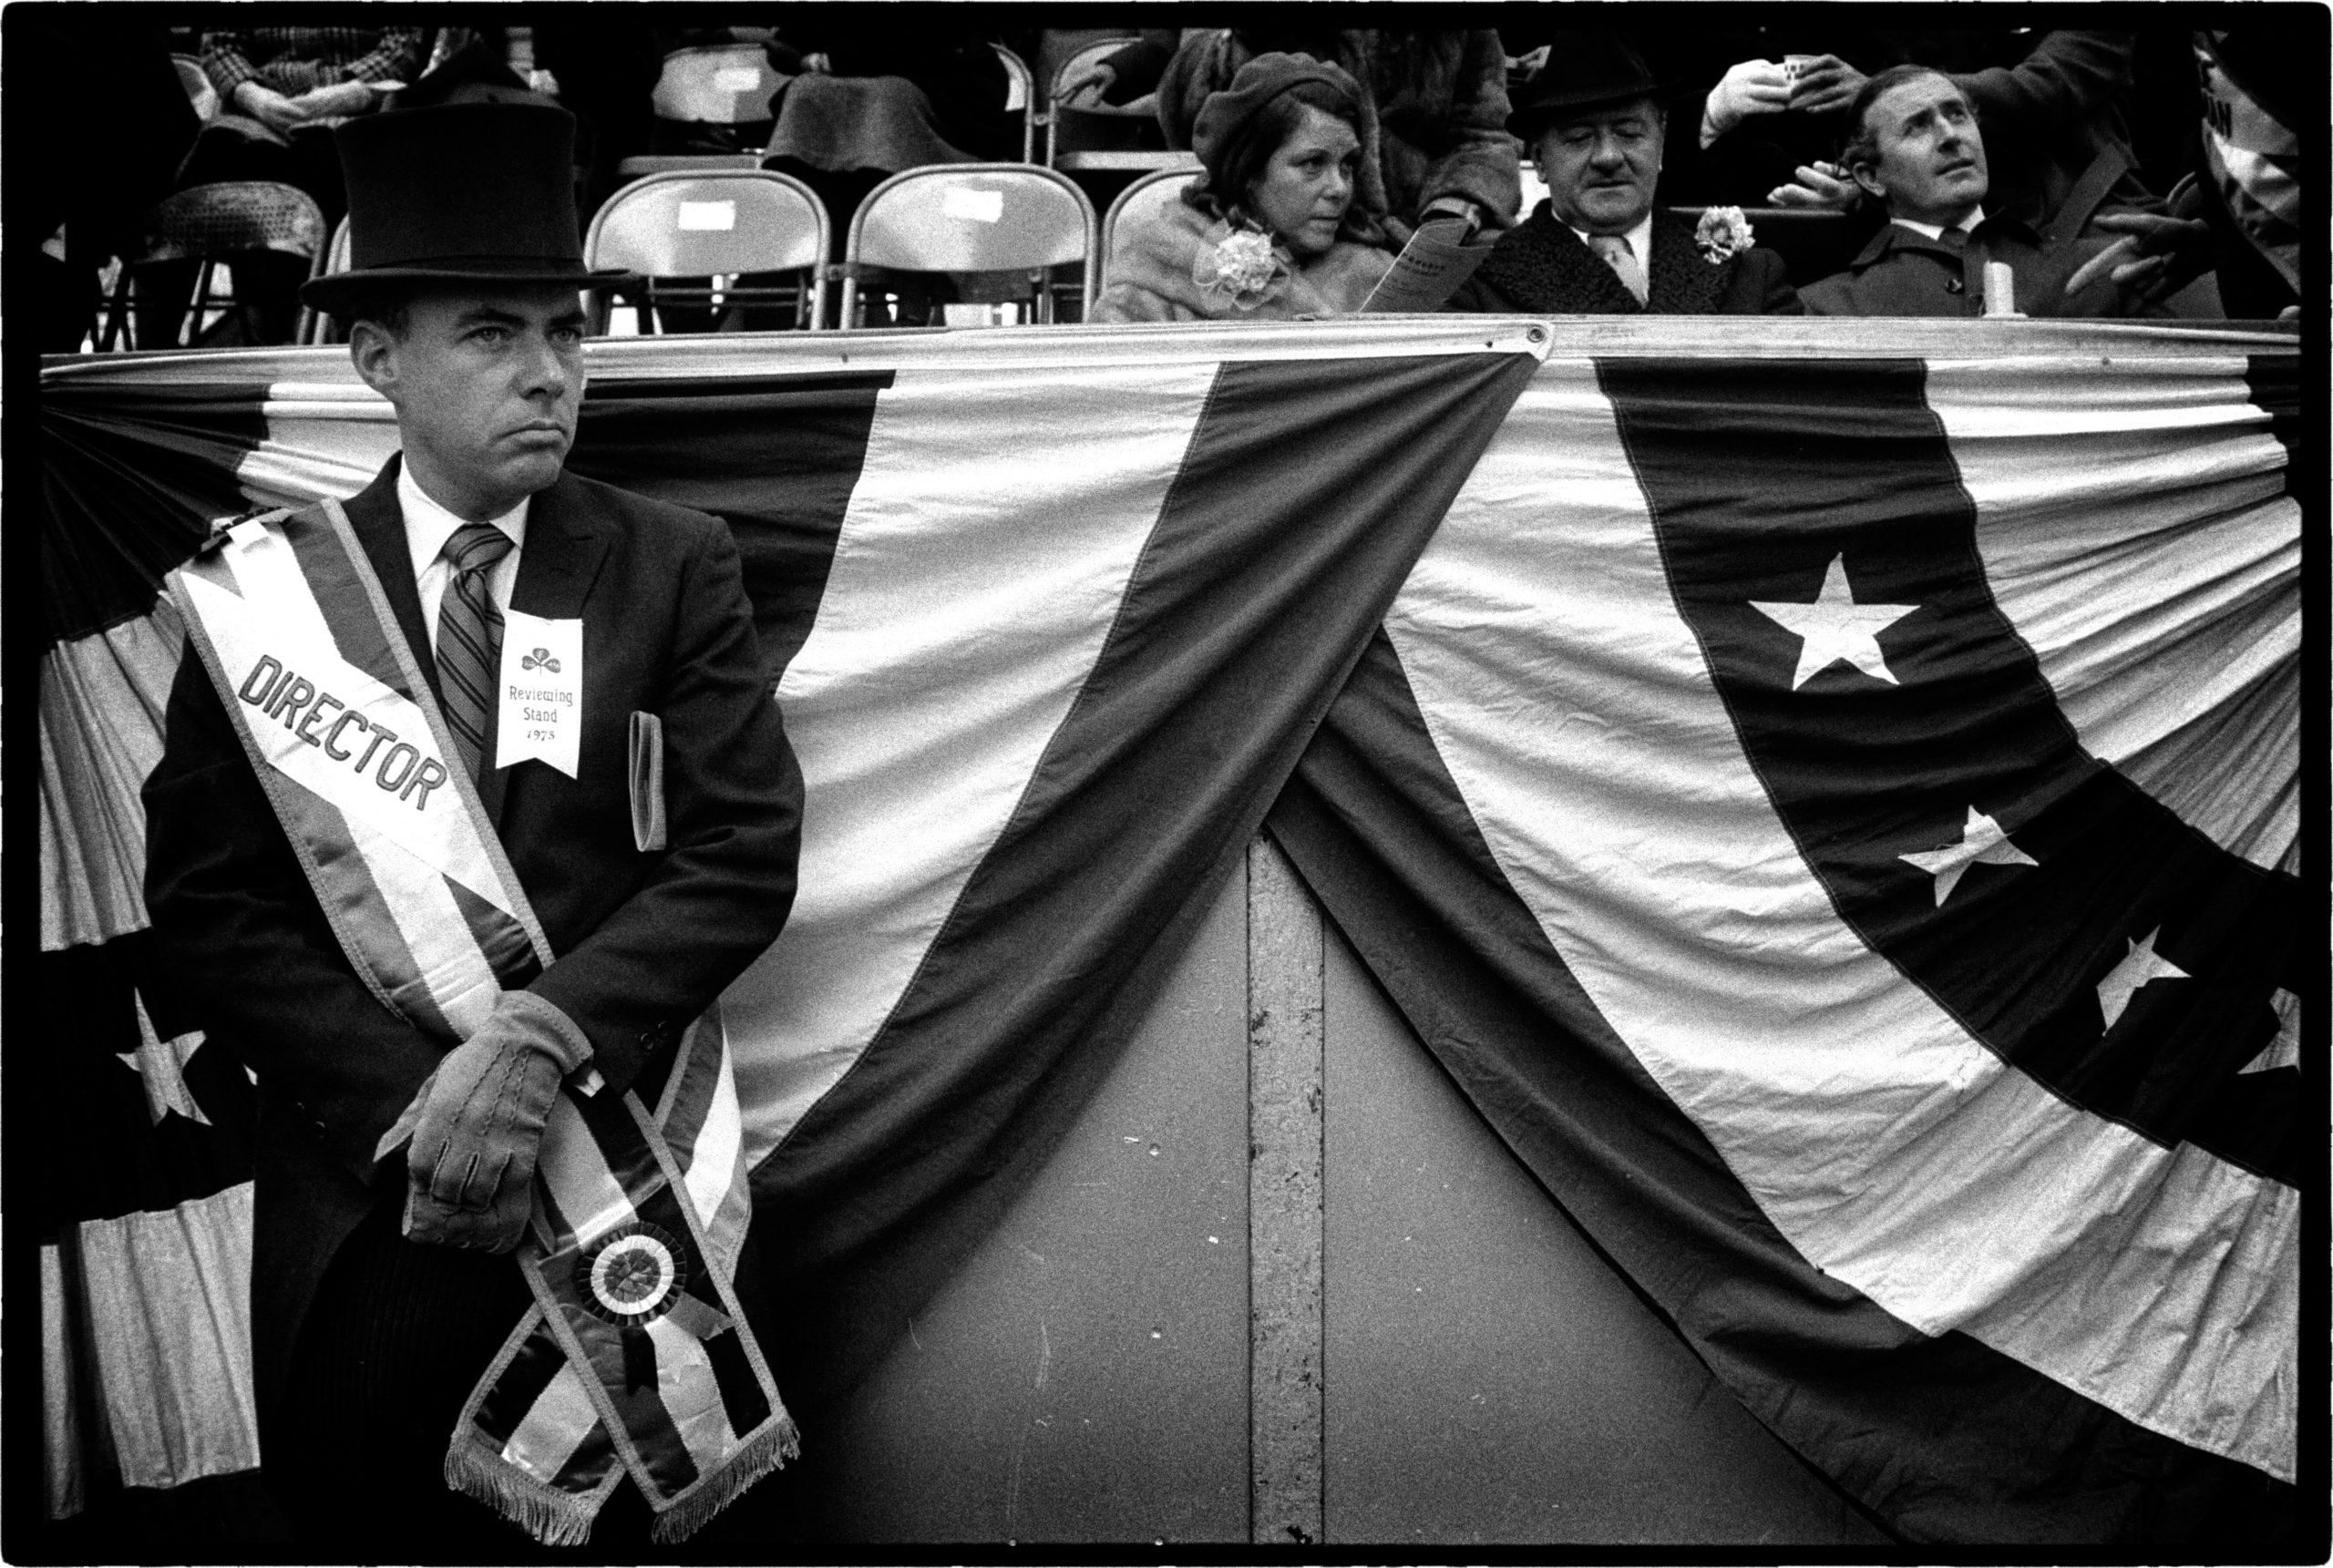 75_0307-8-USA-B-SV2-scaled AMERICA D' ALAIN KELER ART Non classé PHOTOGRAPHIE